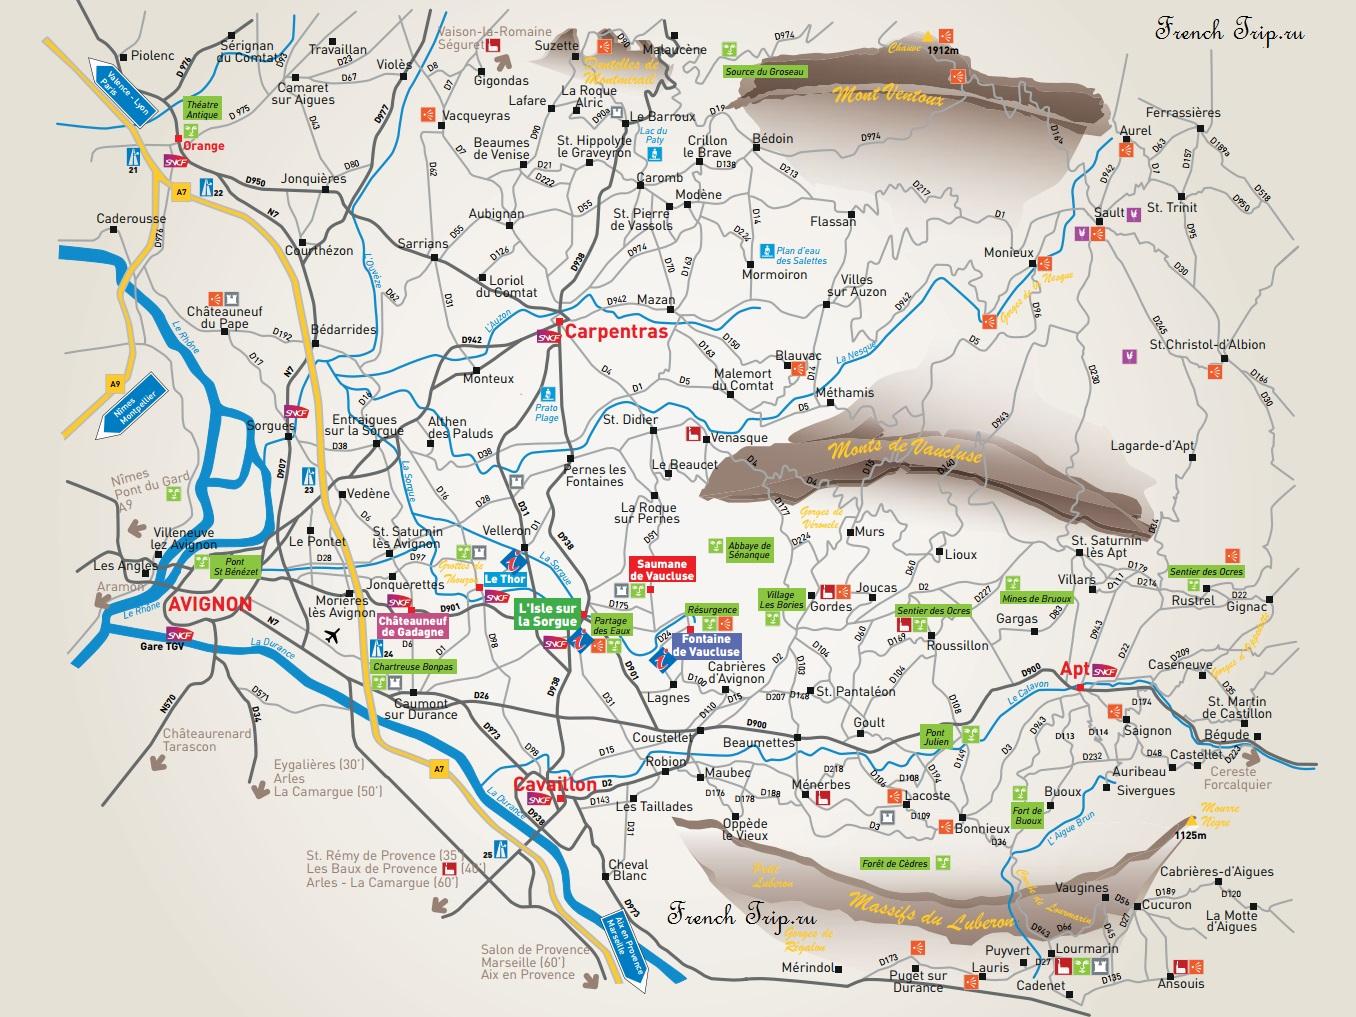 Luberon-достопримечательности Люберона на карте L'Isle-sur-la-Sorgue (Л'Иль-сюр-ла-Сорг)